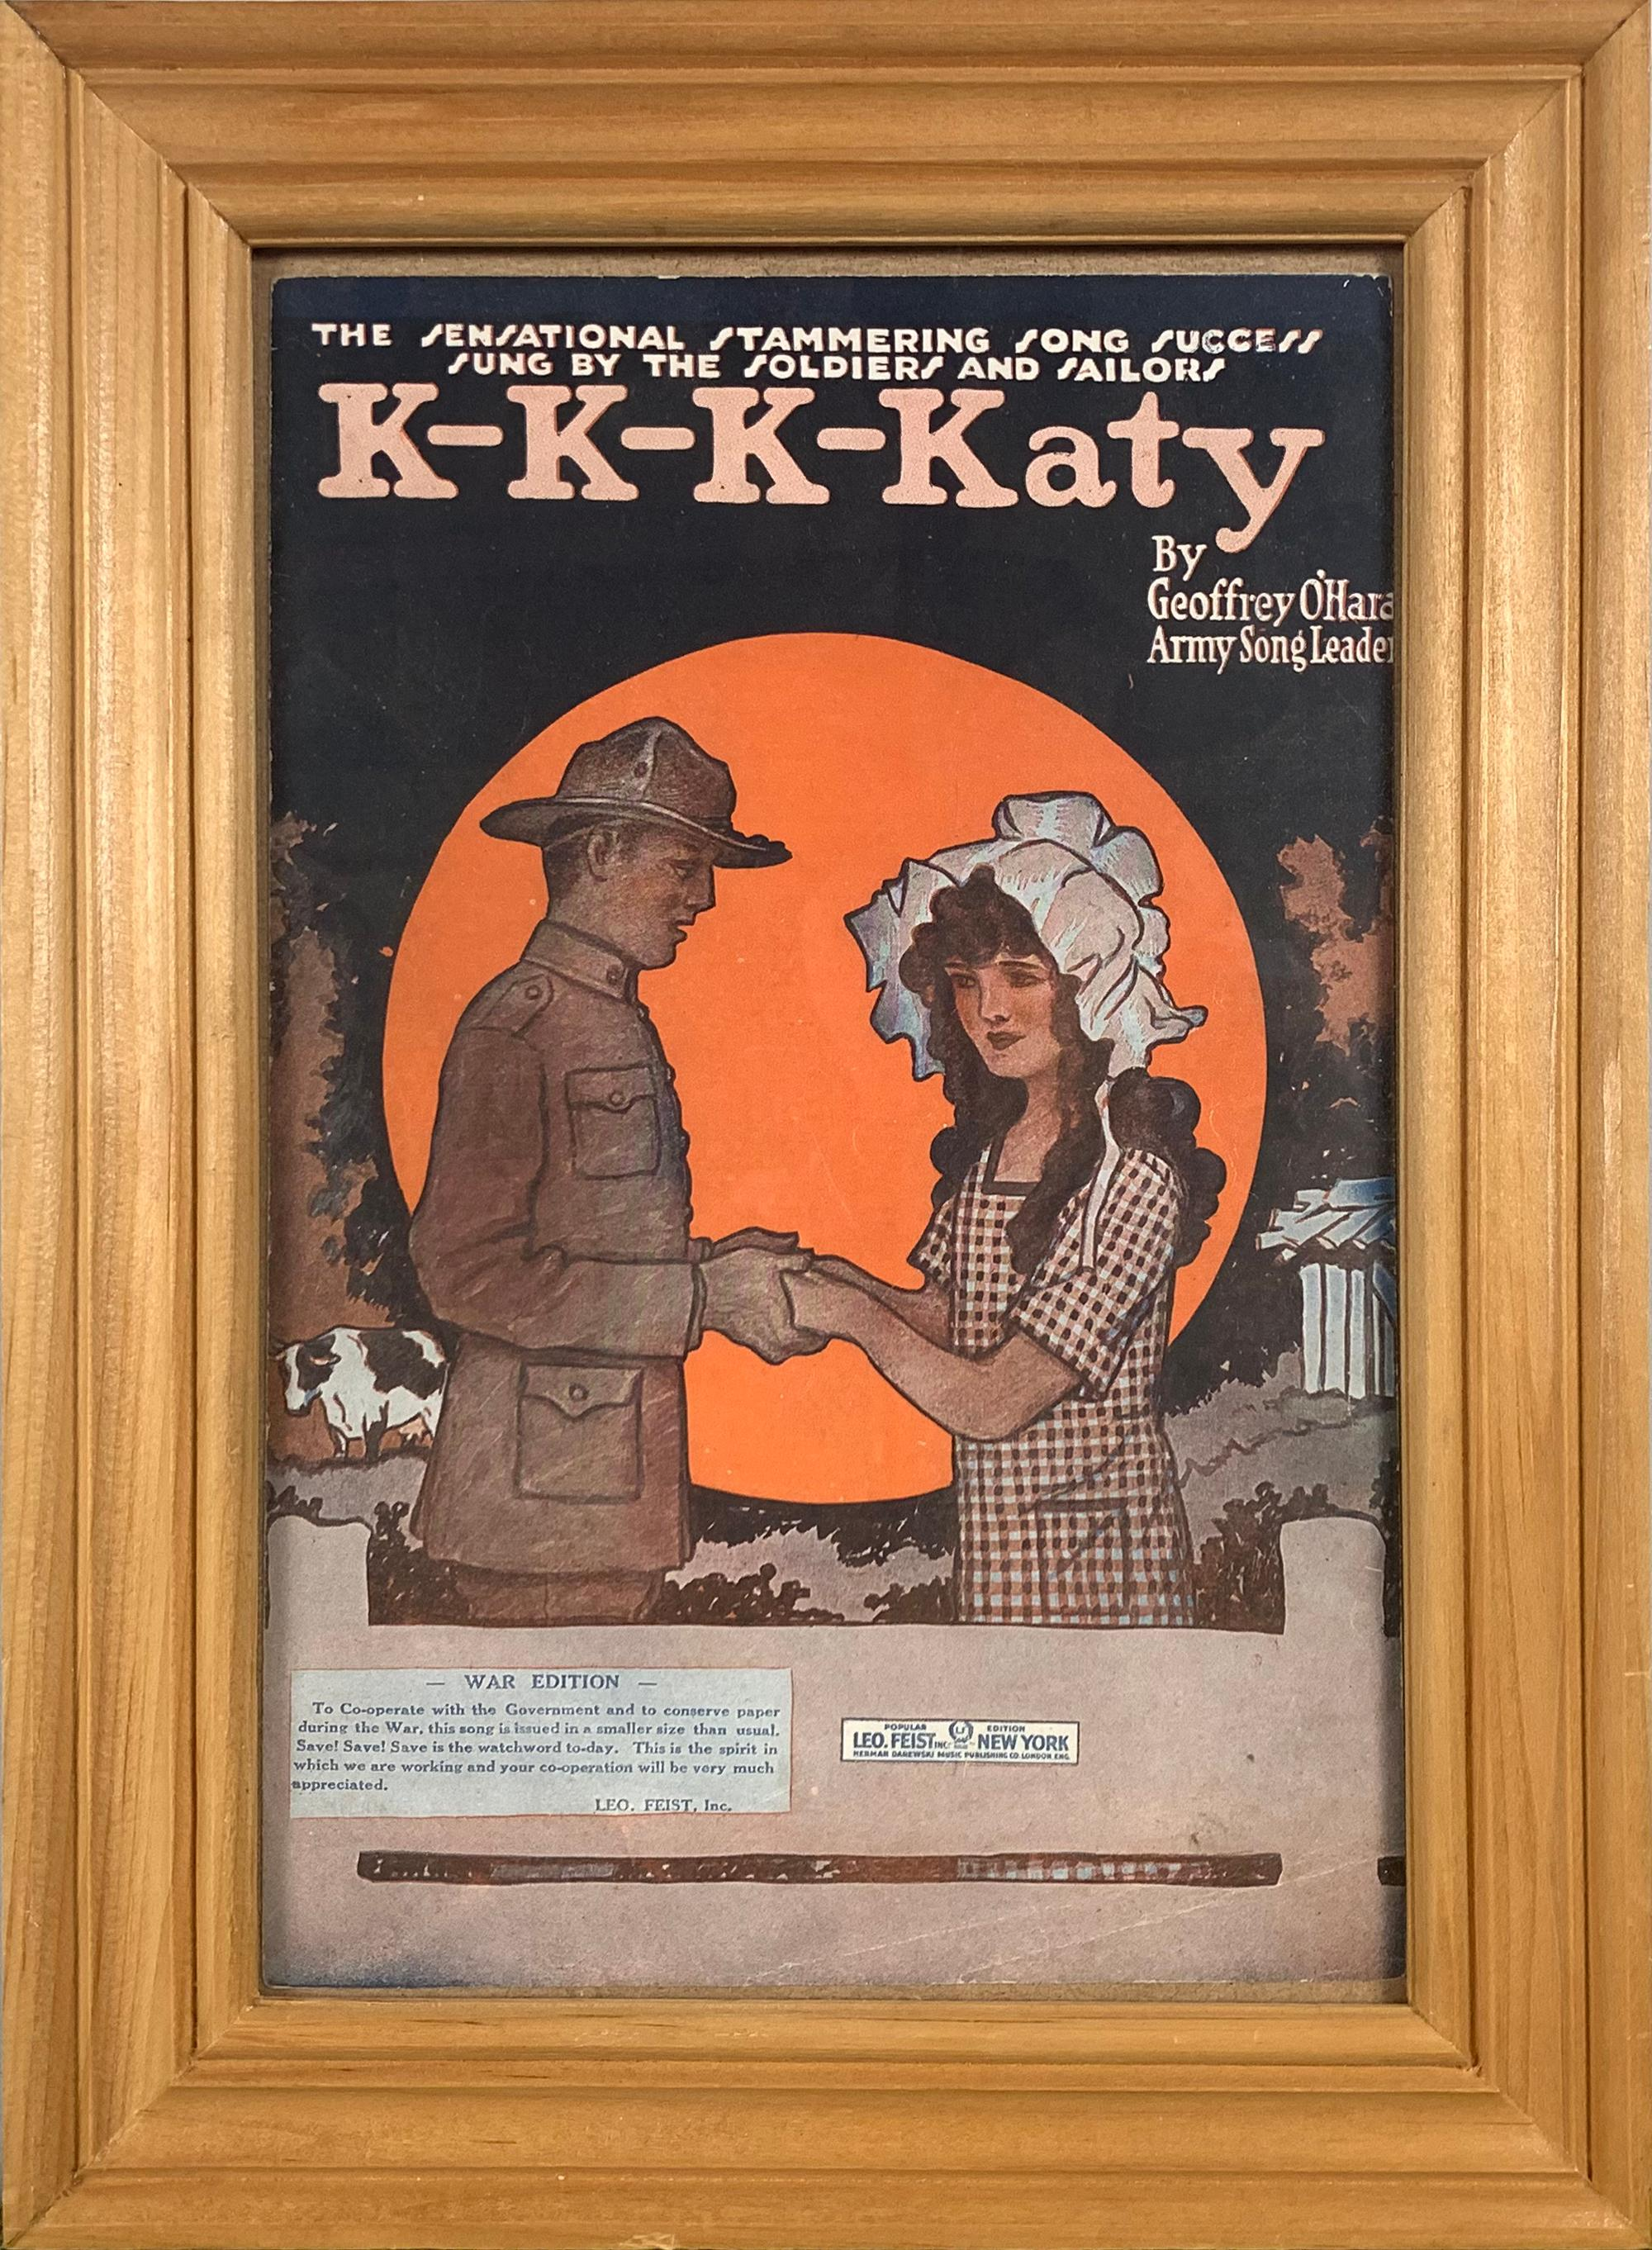 K-K-K-Katy by Geoffrey O'Hara Poster